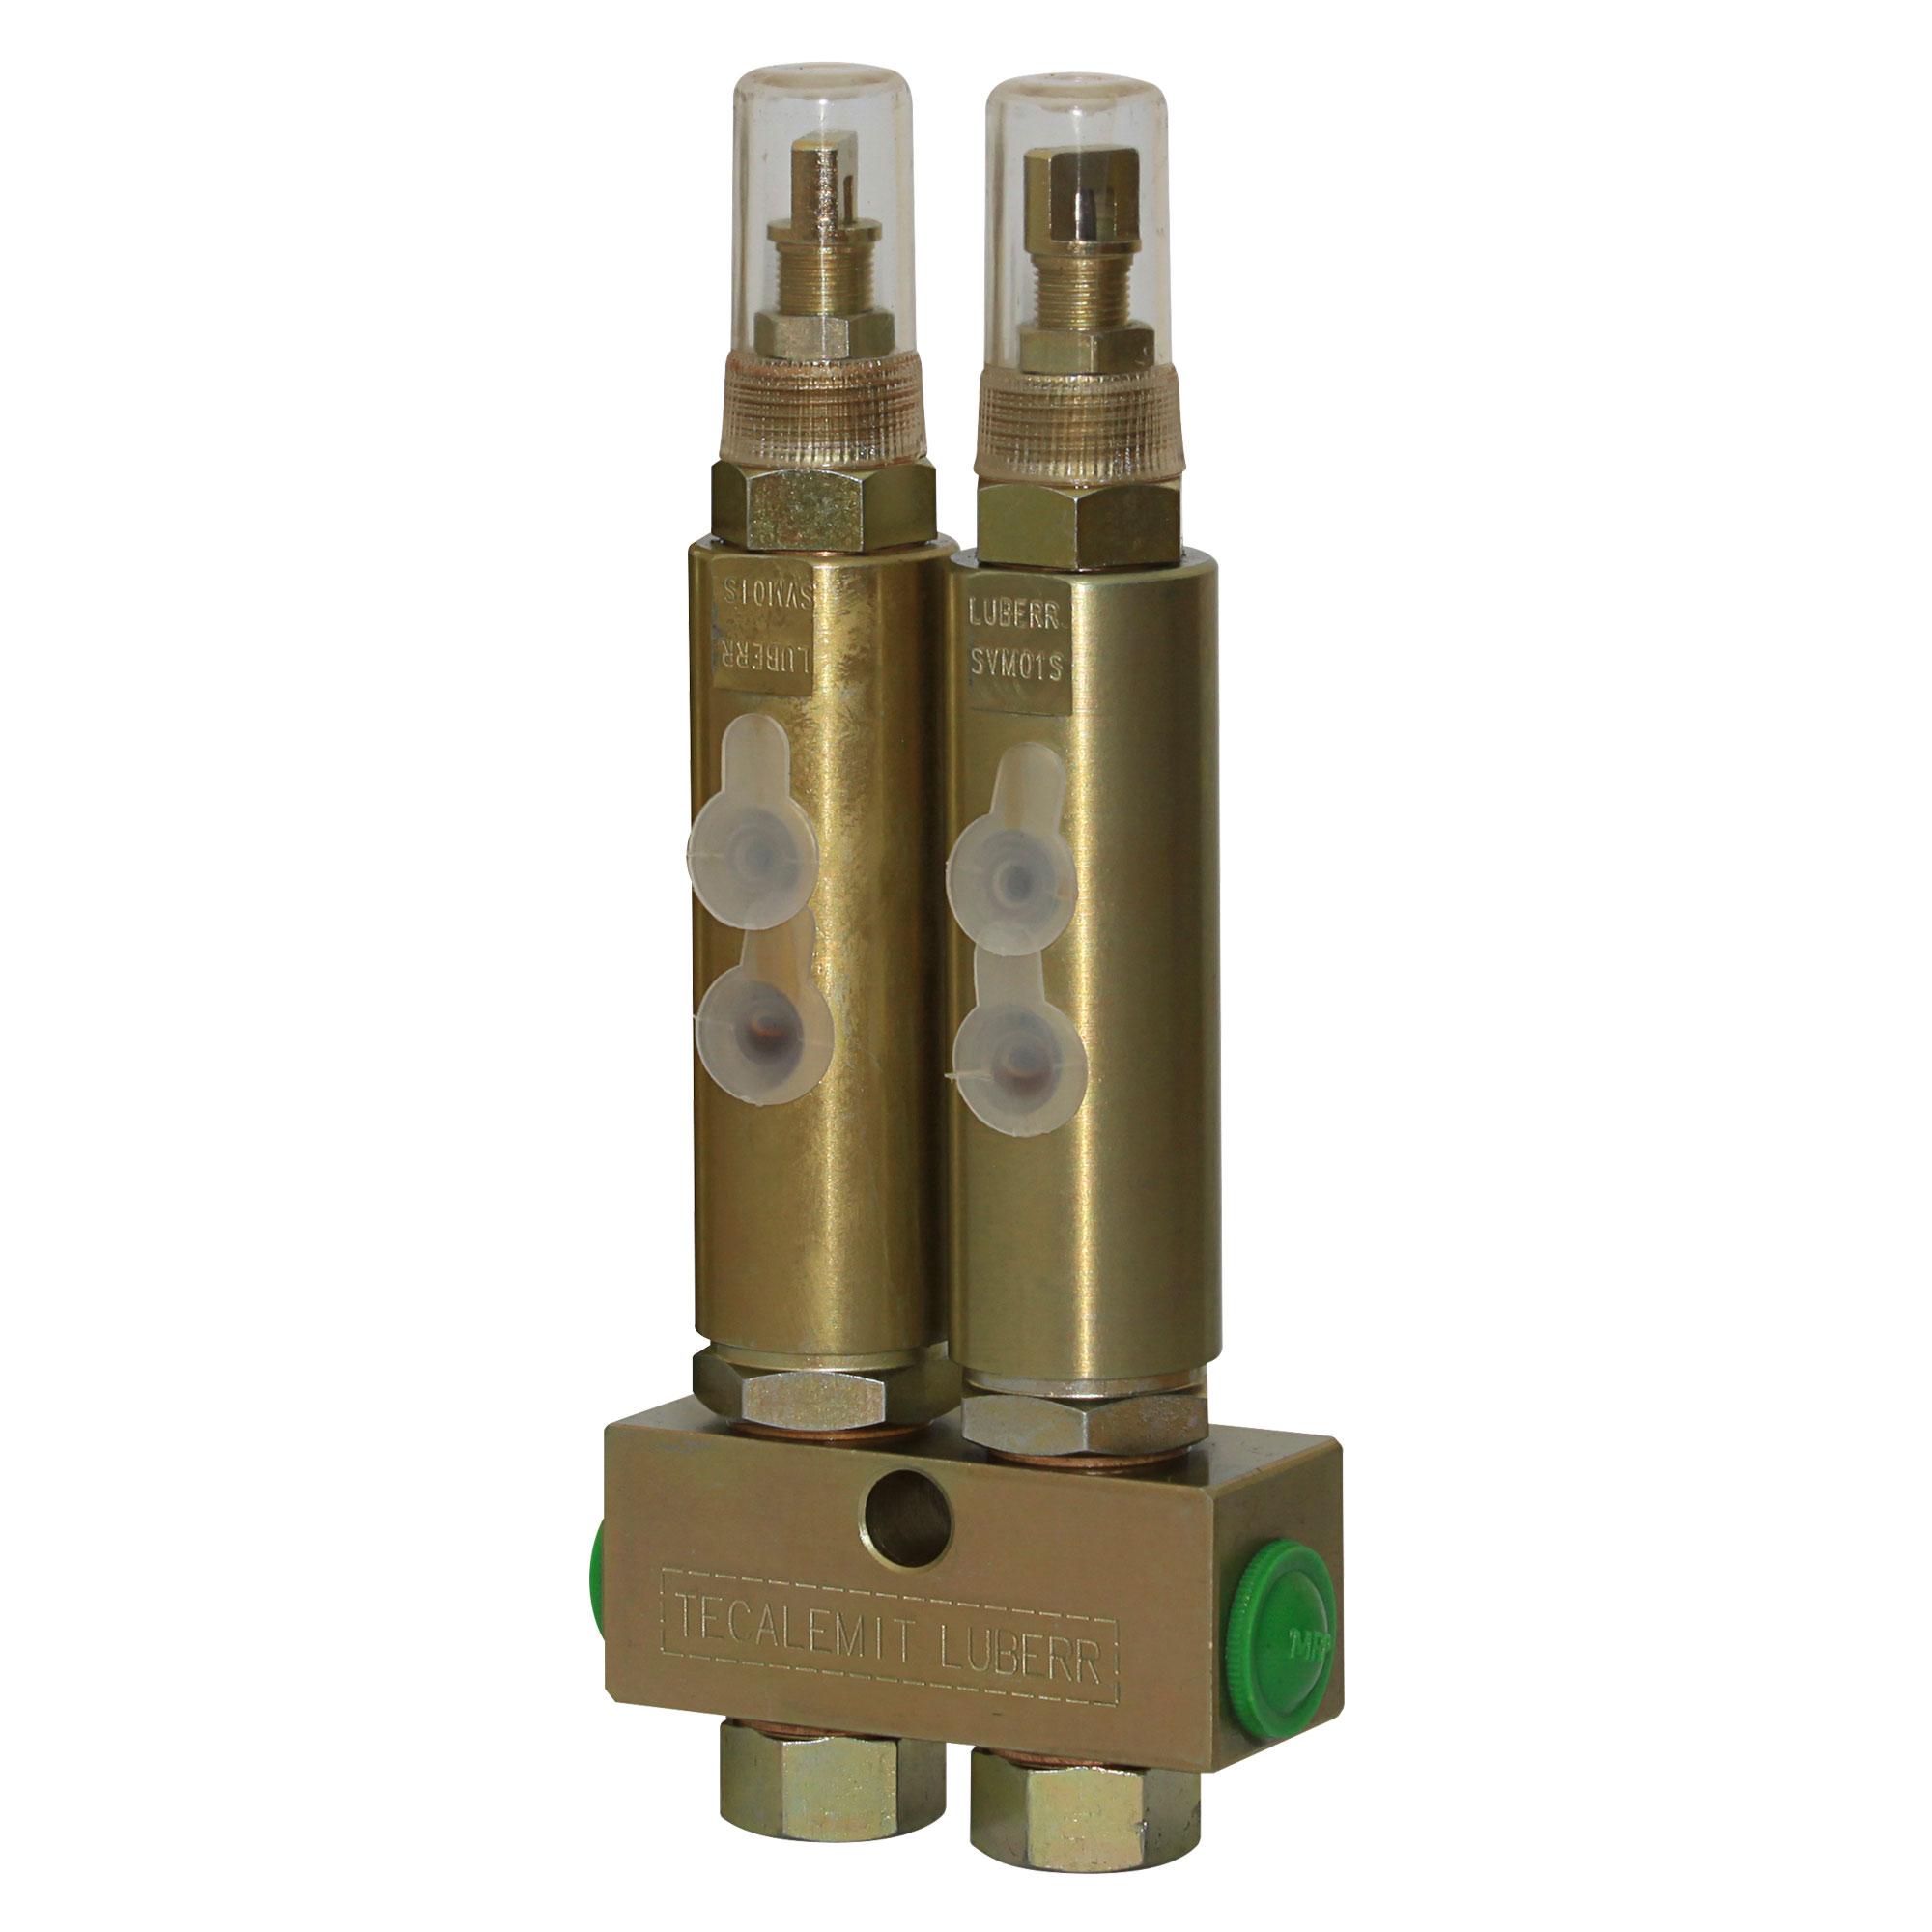 TSLI.2 - Single Line Grease Injector & Manifold Assembly